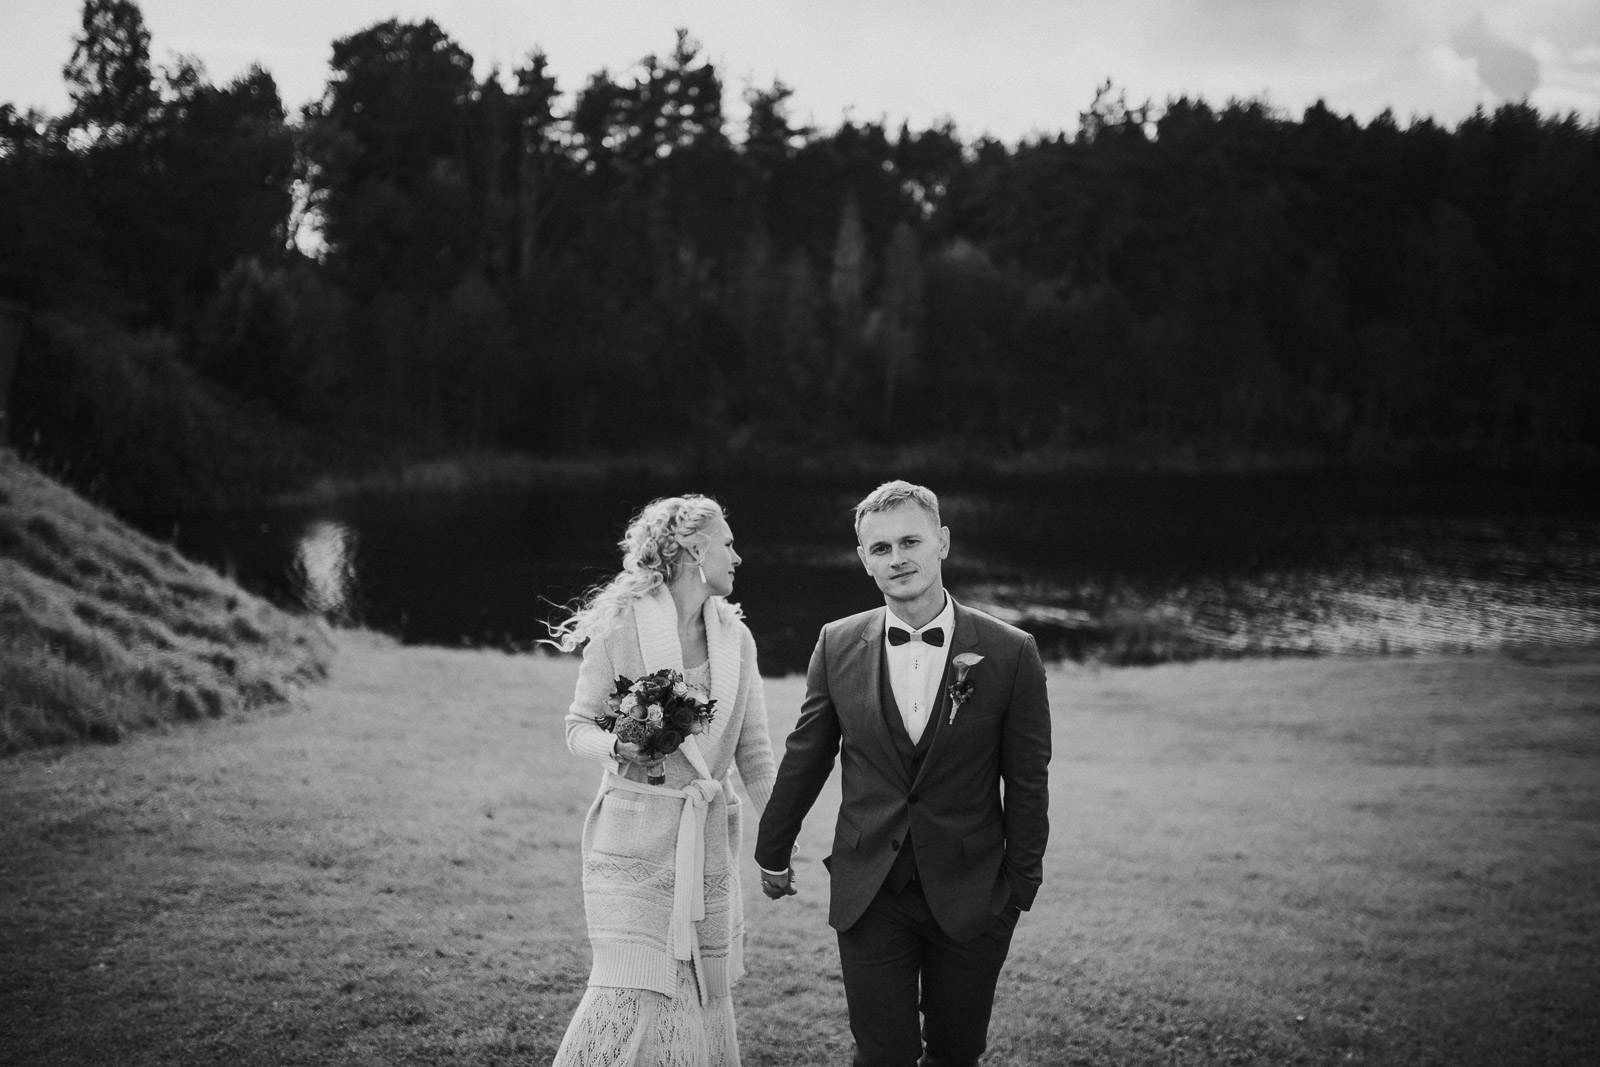 Best-of-weddings-2016-m&j-studios-Mait-Juriado-099